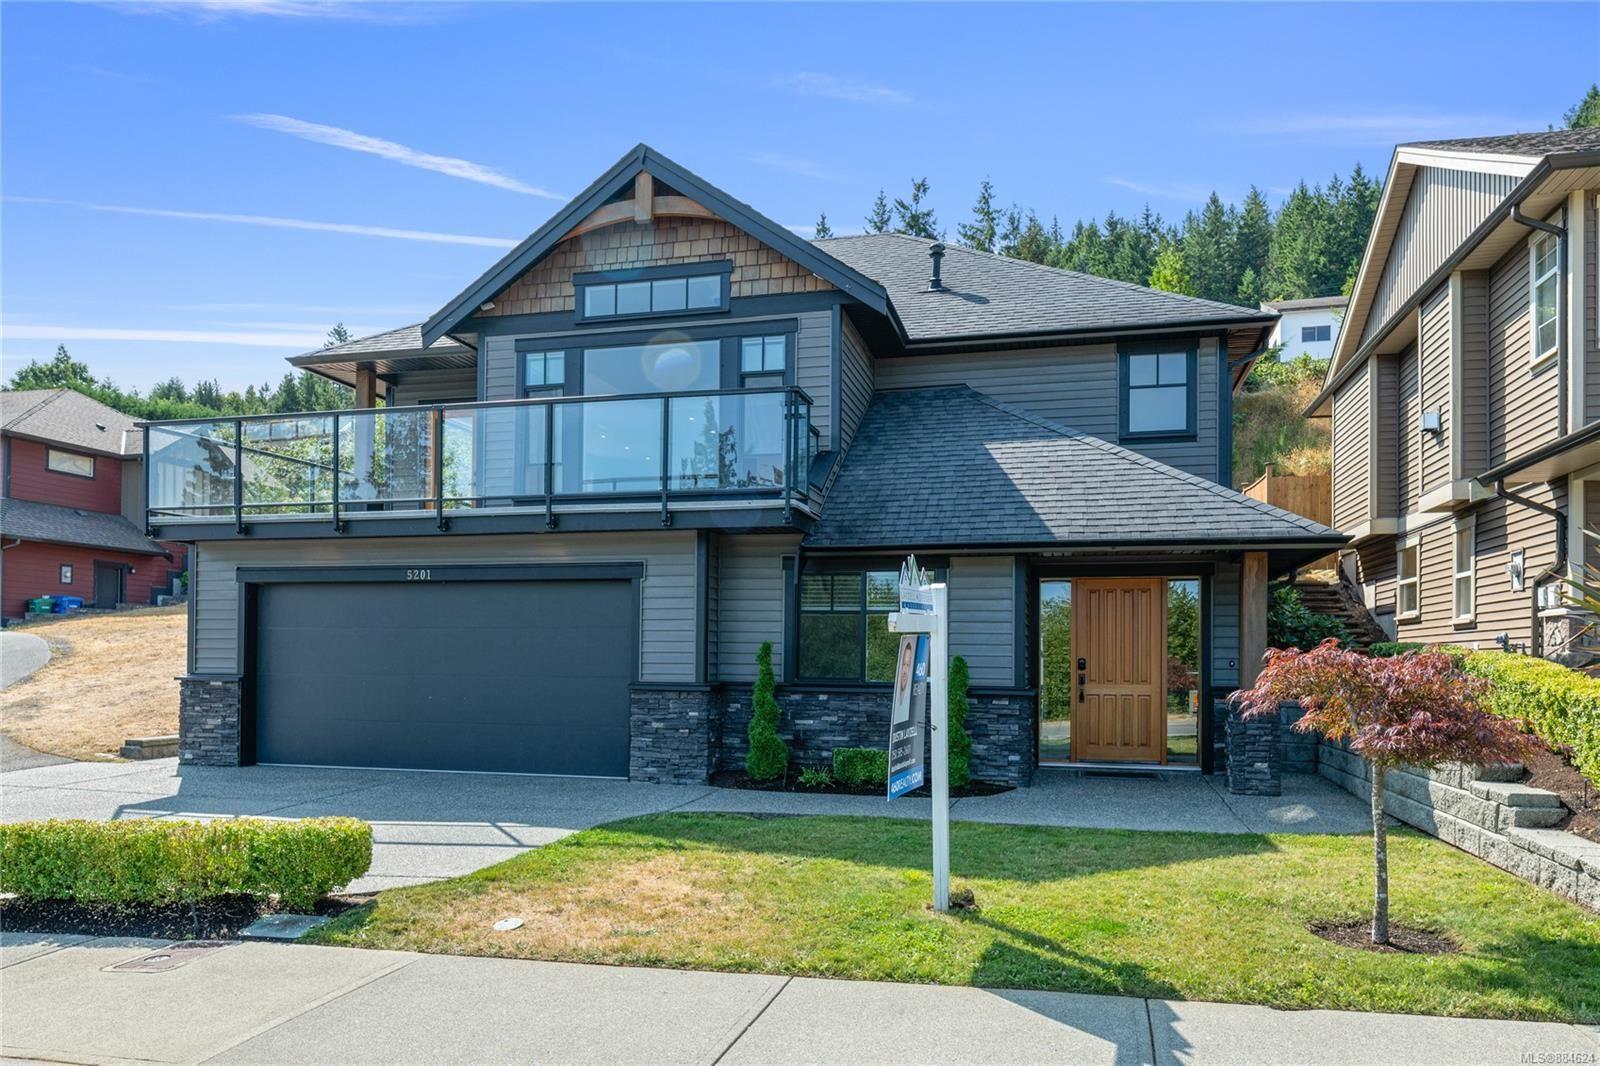 Main Photo: 5201 Dewar Rd in Nanaimo: Na North Nanaimo House for sale : MLS®# 884624